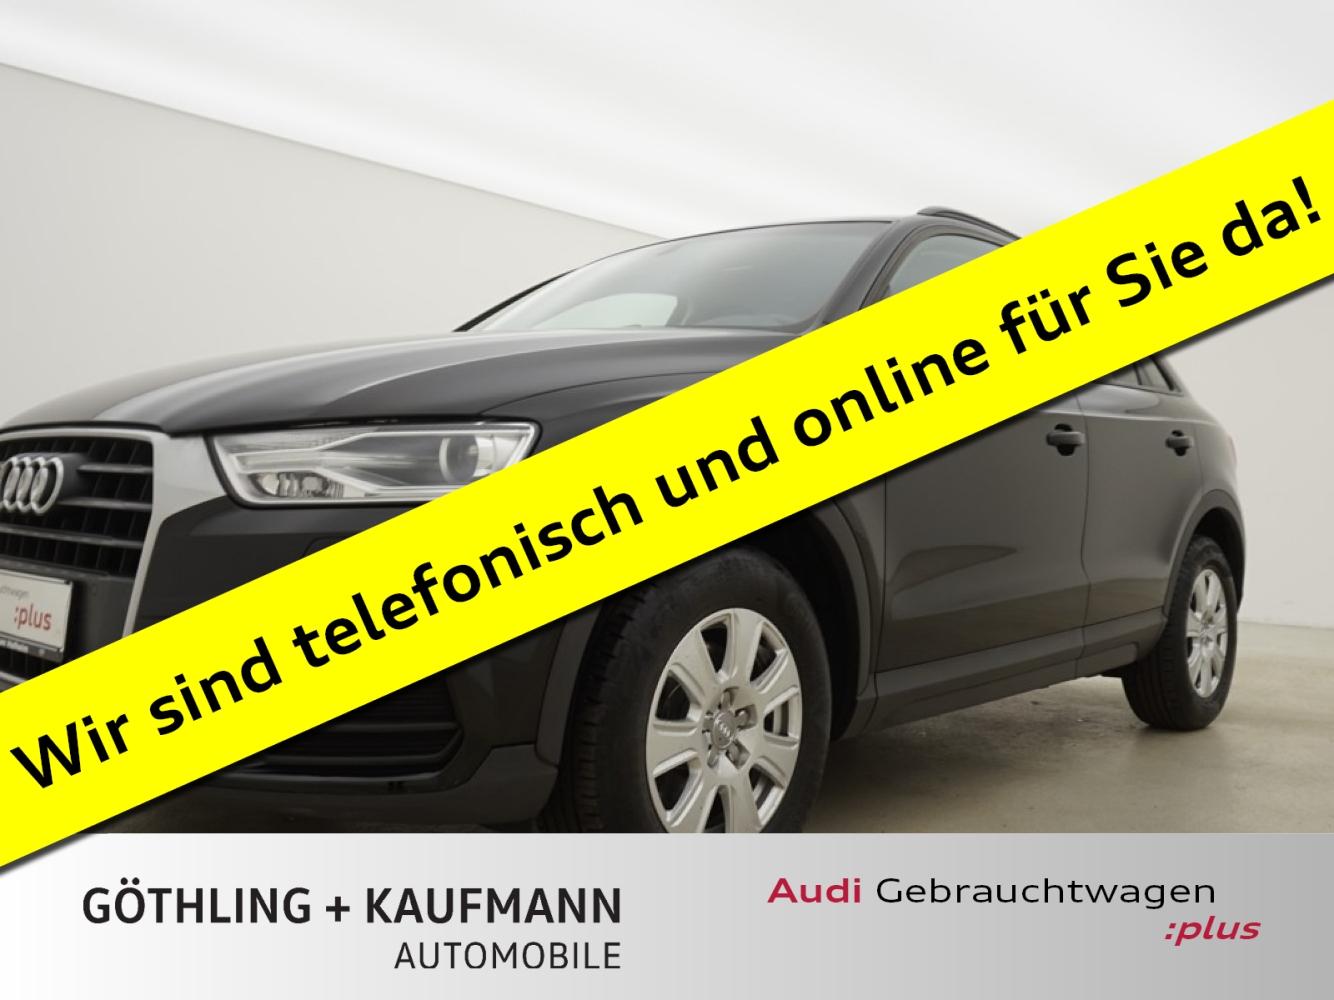 Audi Q3 2.0 TDI qu. S tro. 110kW*Xenon+*Navi*PDC+*SHZ, Jahr 2017, Diesel